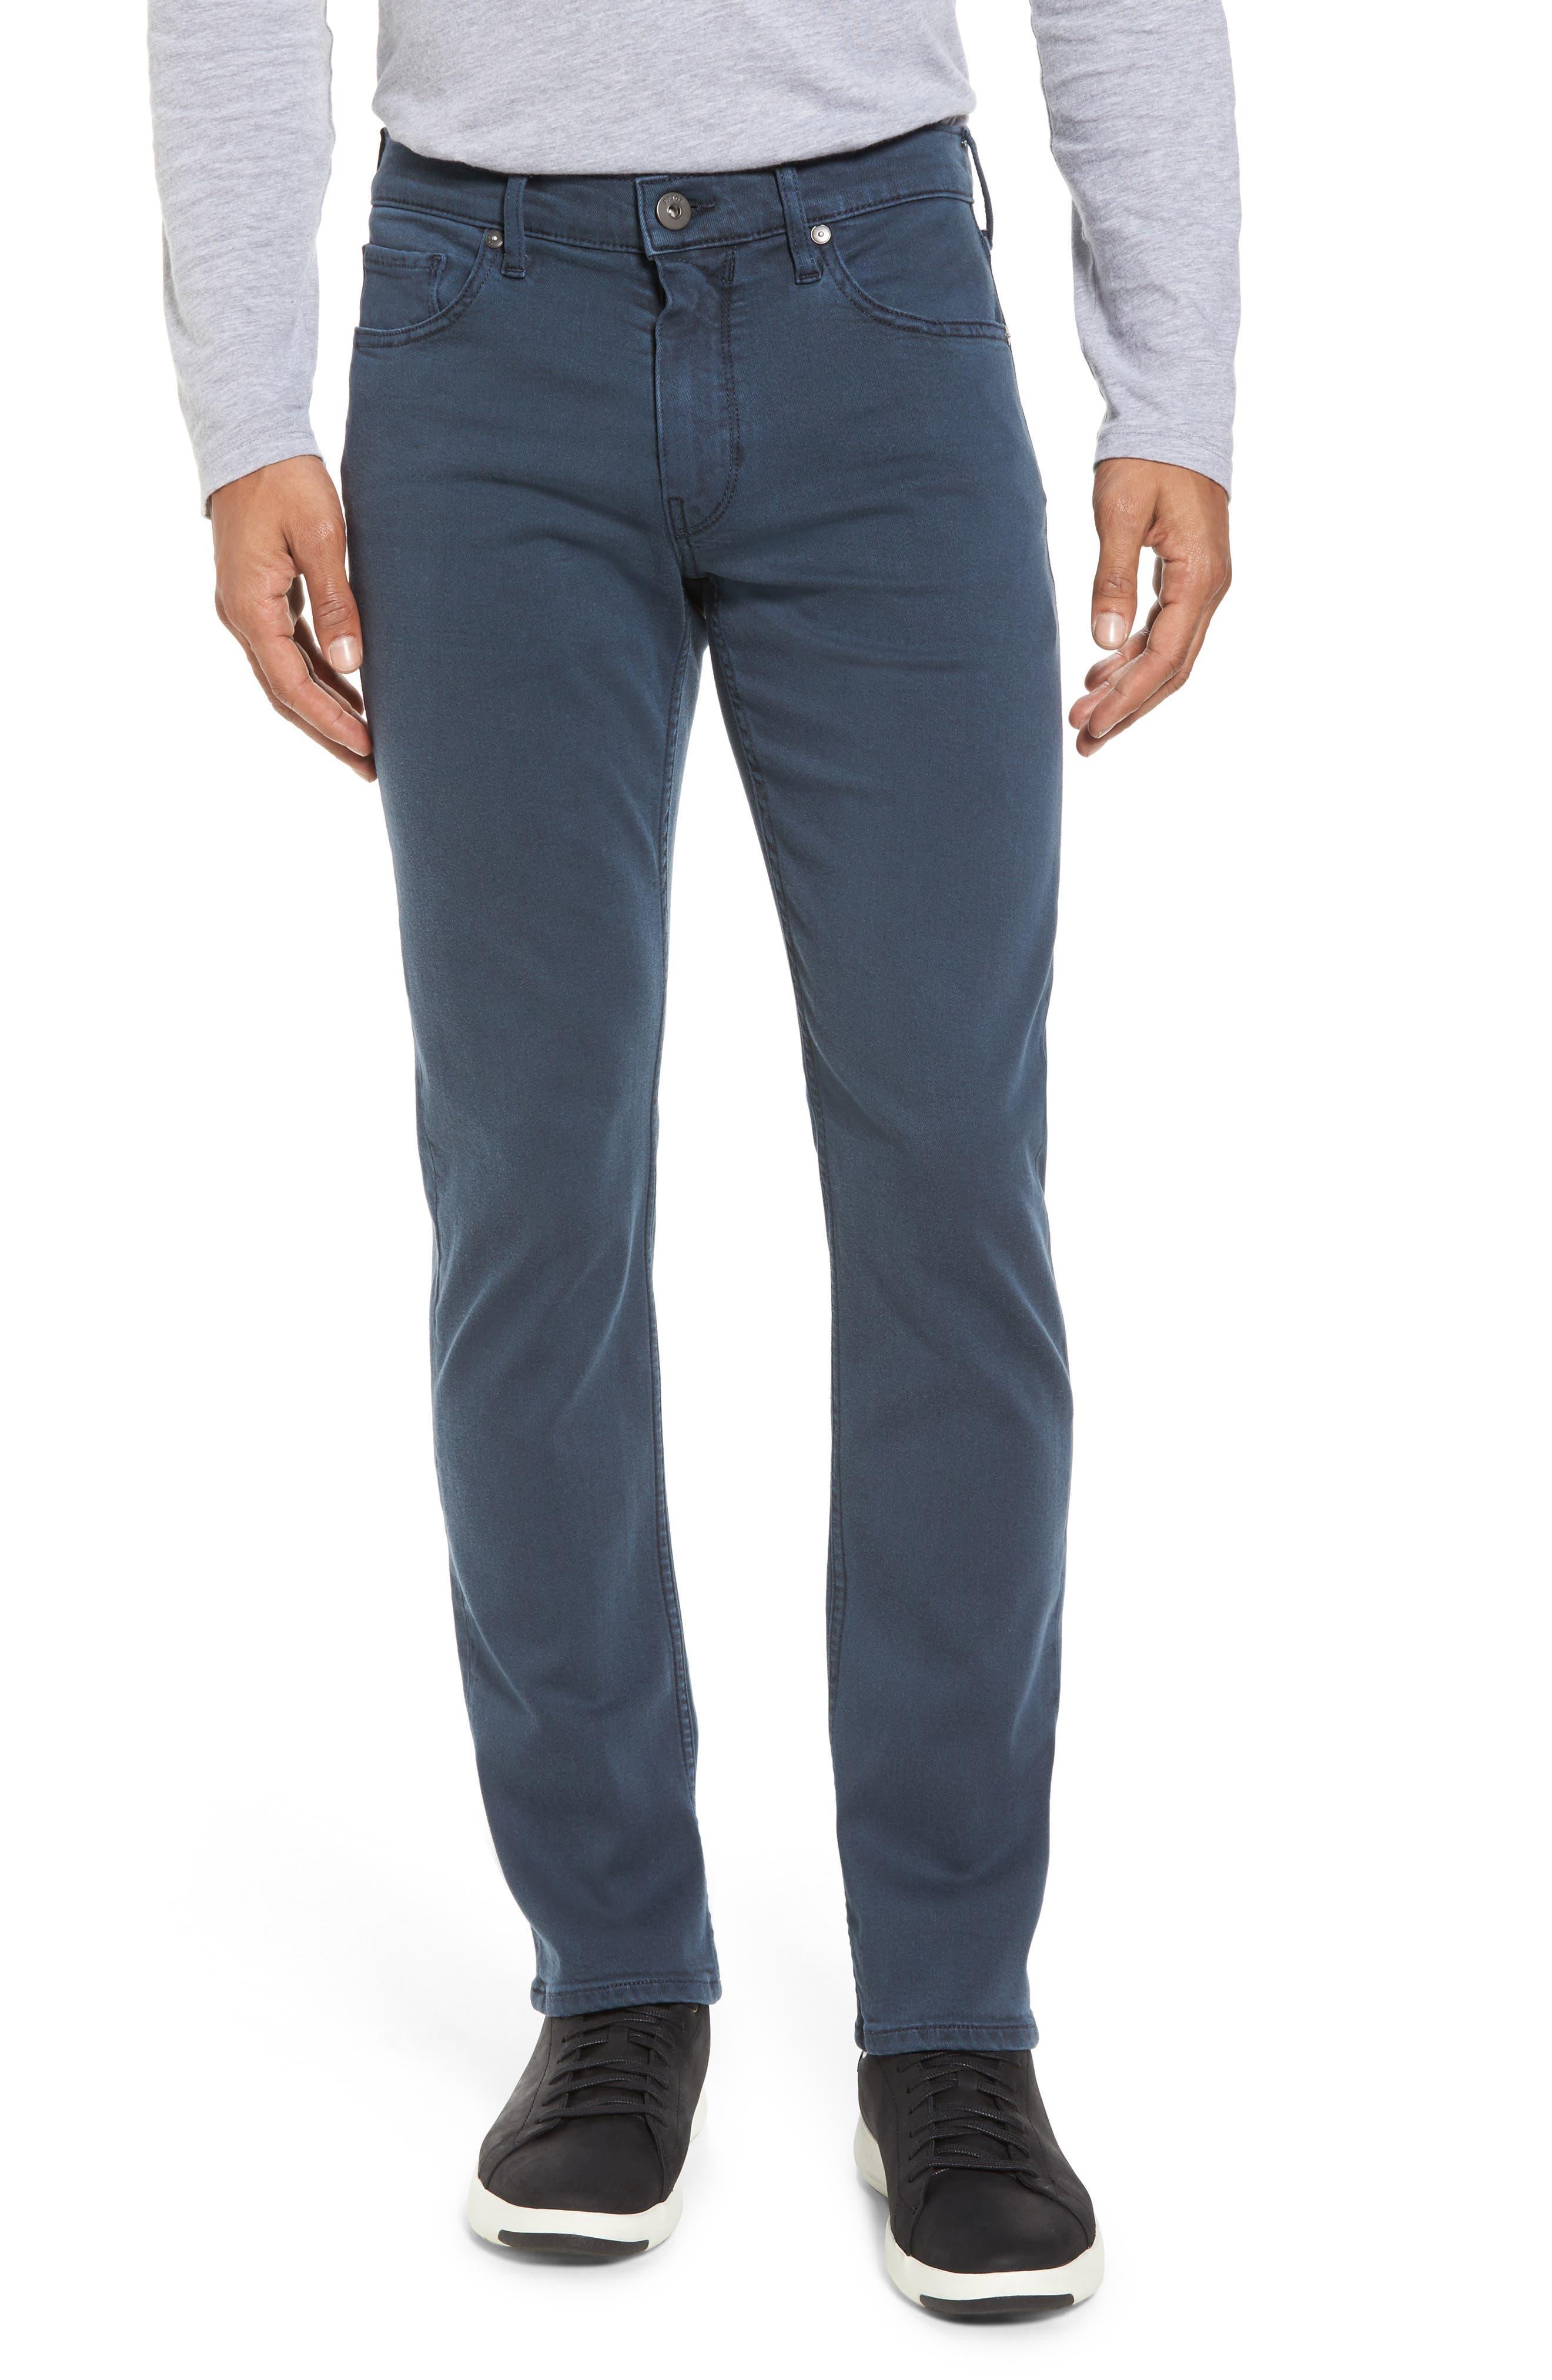 Lennox Slim Fit Jeans,                             Main thumbnail 1, color,                             Vintage Amalfi